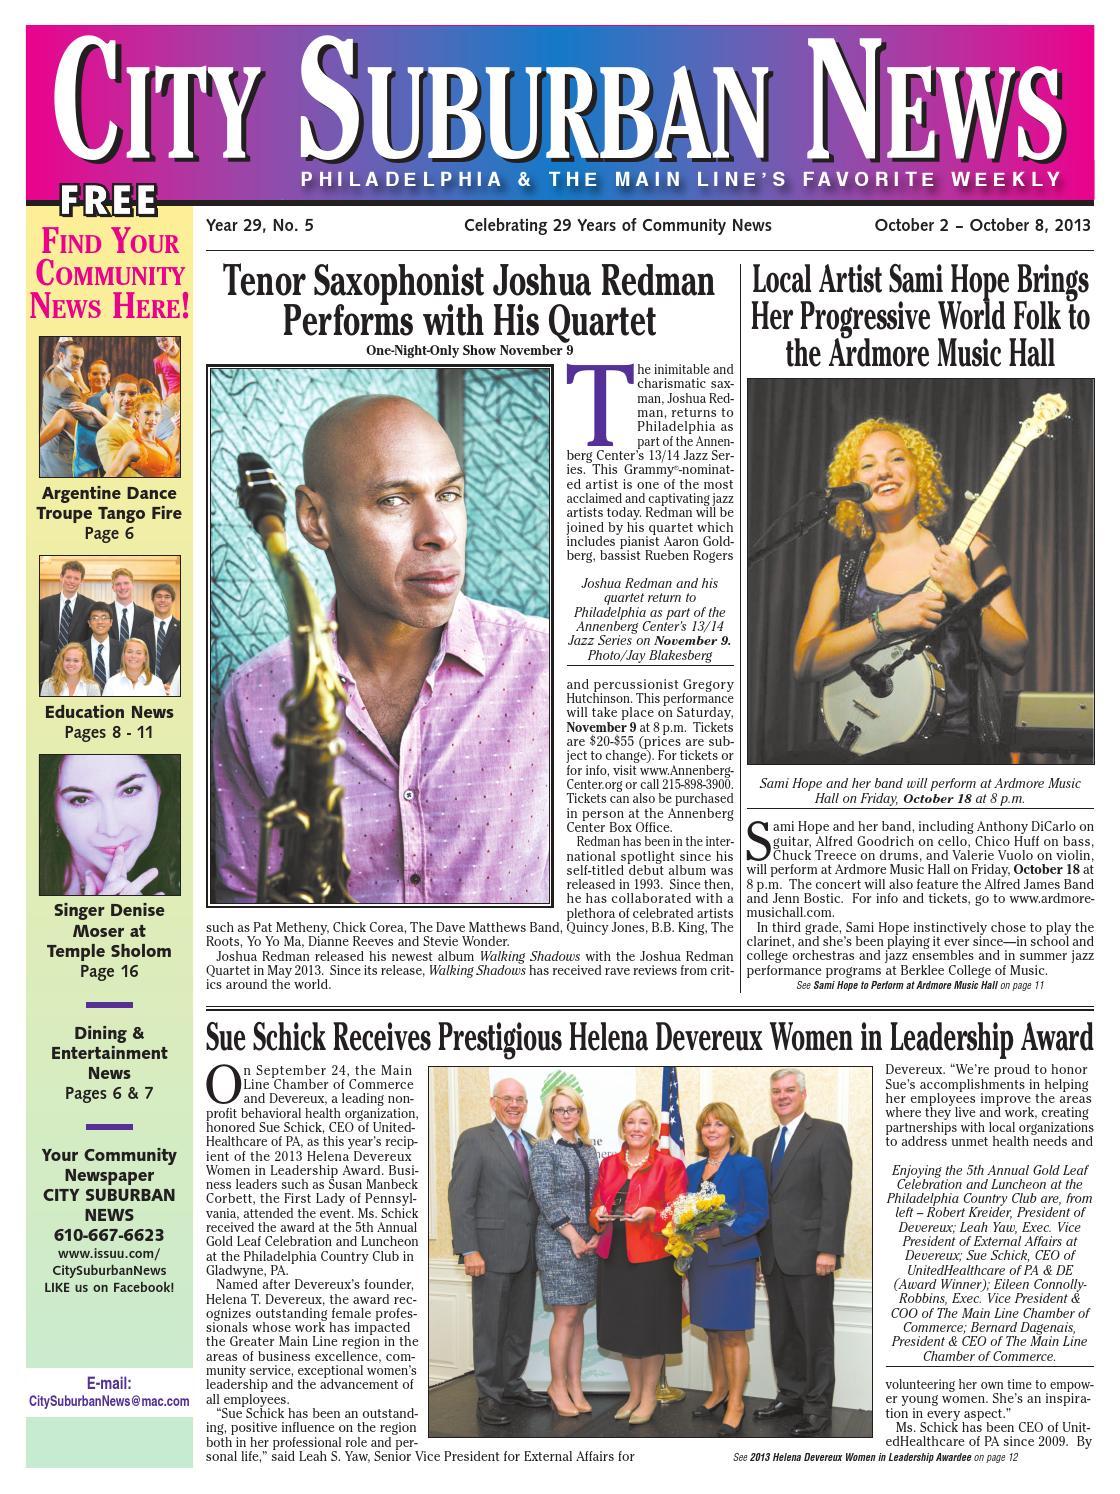 e748f4b2e342 City Suburban News 10 2 13 issue by City Suburban News - issuu